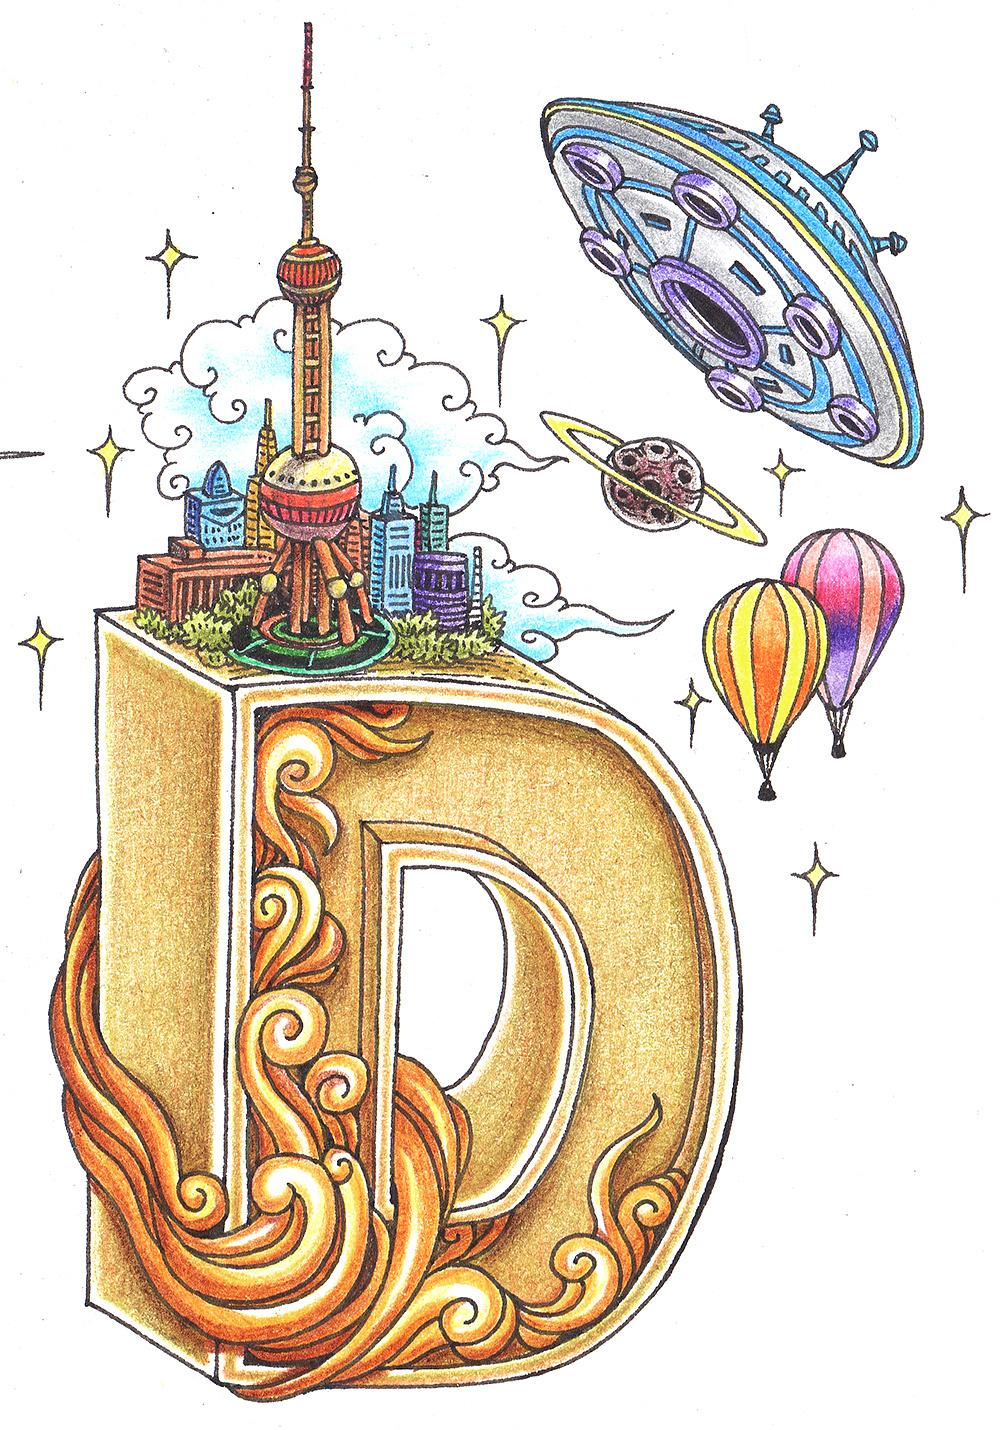 《jfd》彩铅手绘插图|插画|商业插画|傅淳强 - 原创